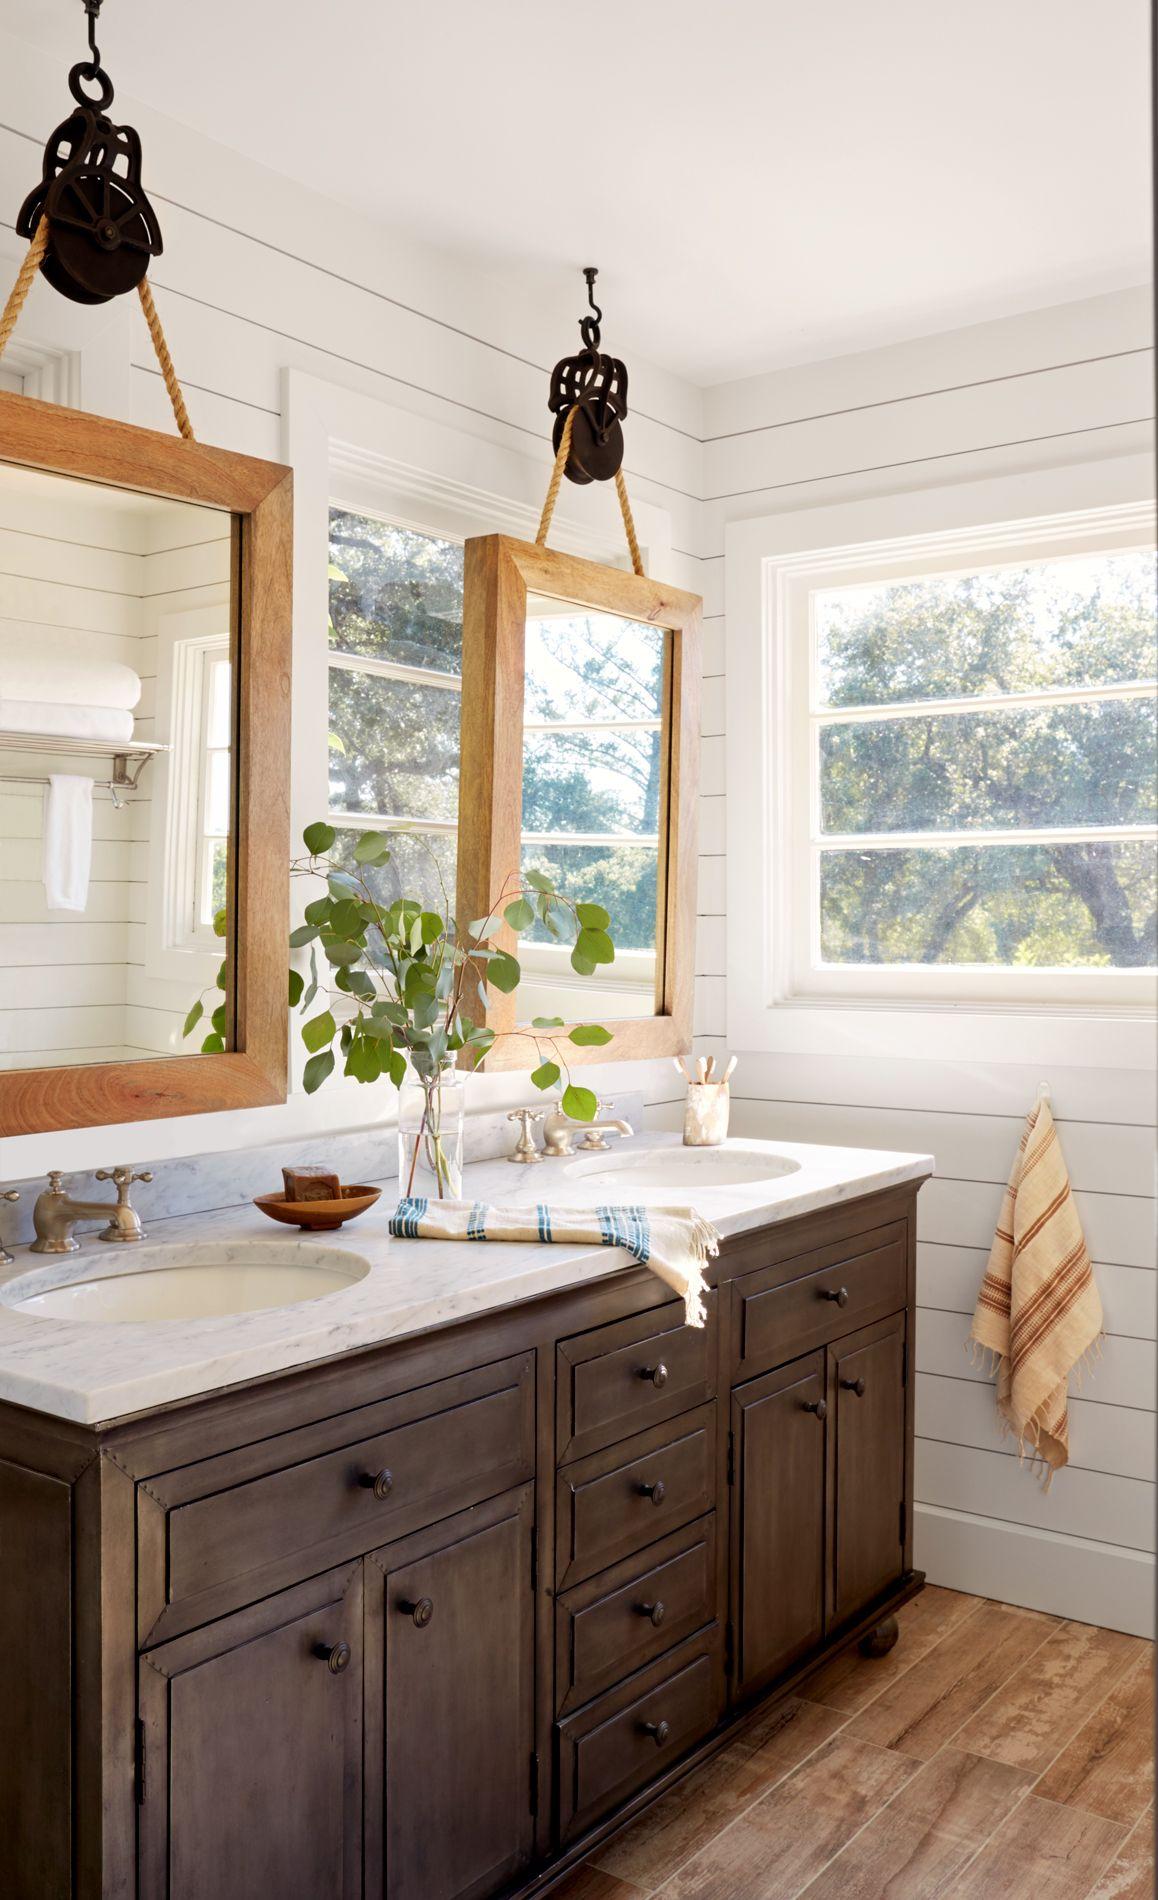 Best Kitchen Gallery: 90 Best Bathroom Decorating Ideas Decor Design Inspirations For of Vintage Bathroom Designs  on rachelxblog.com